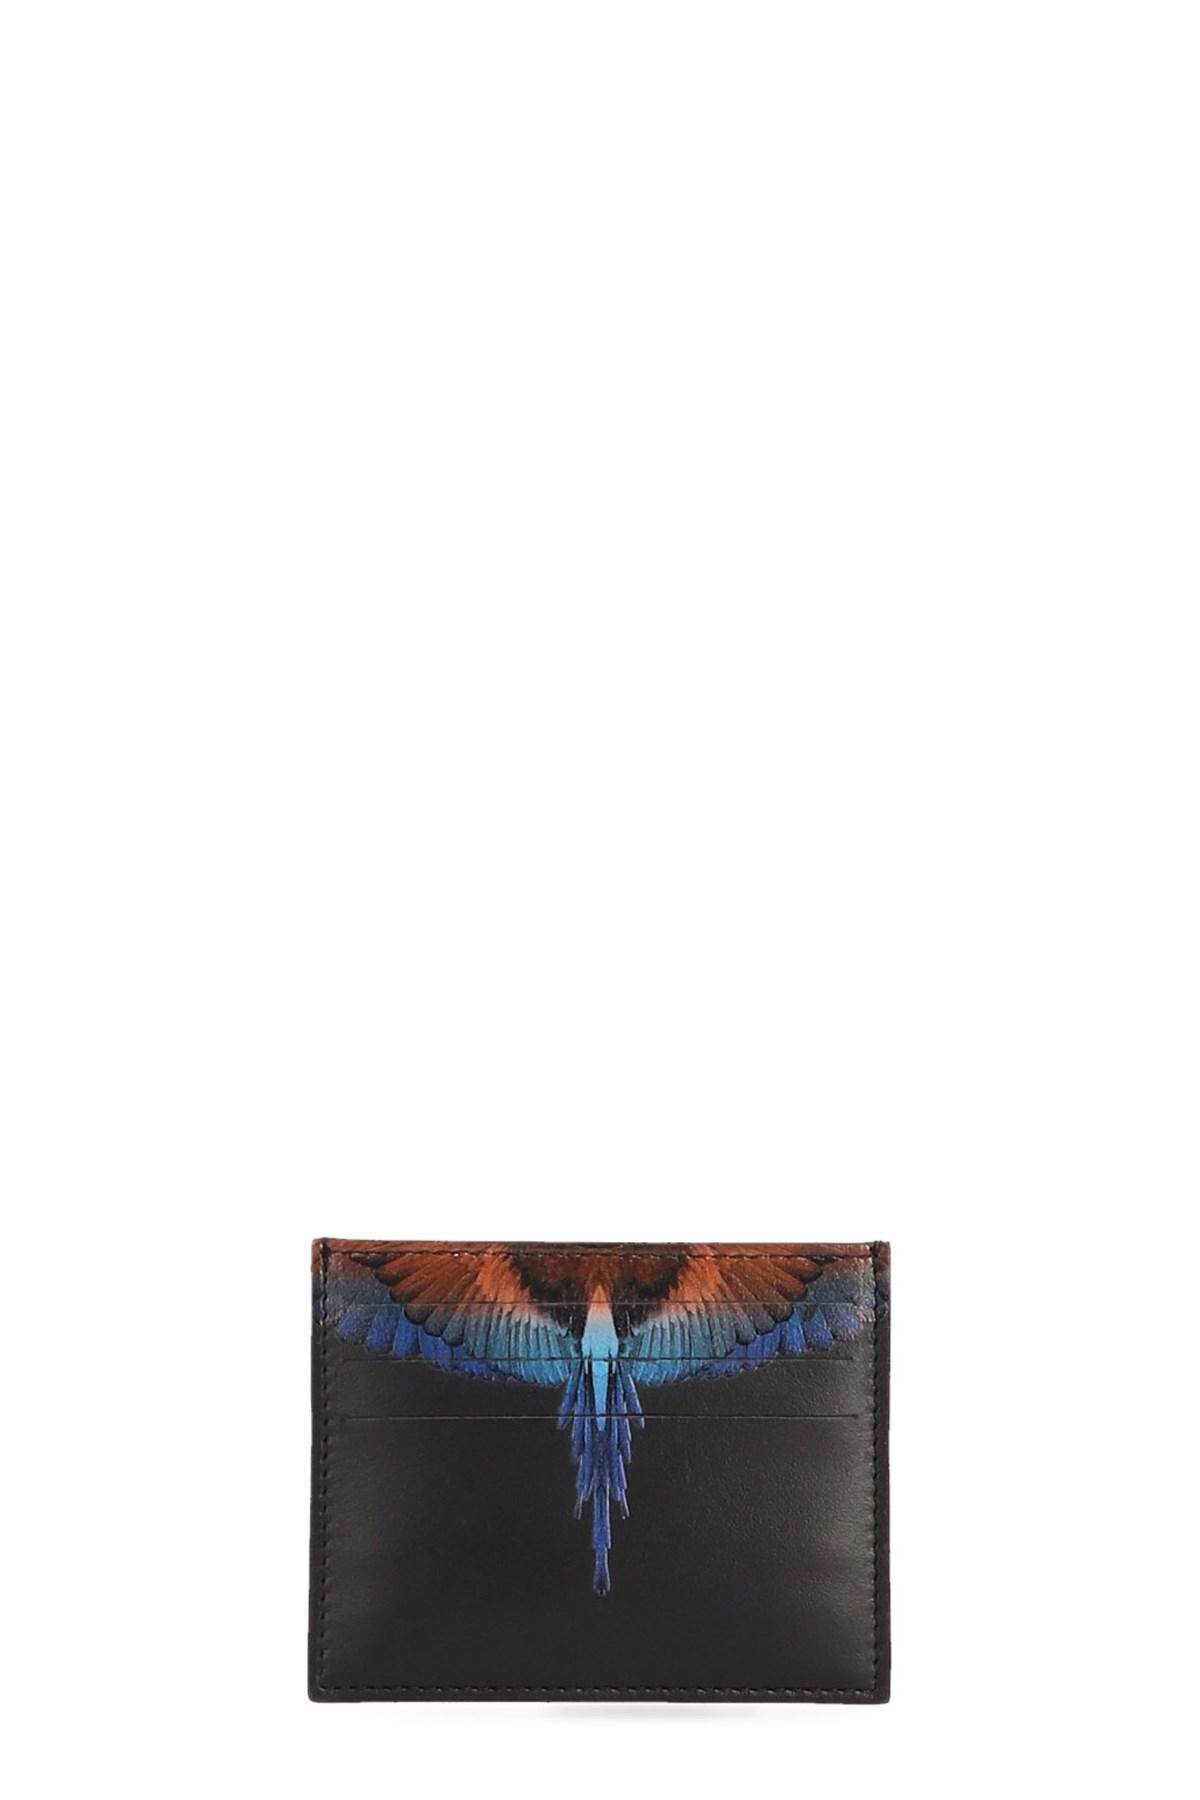 a basso prezzo c770f 48b8c 'Wings' cardhodler